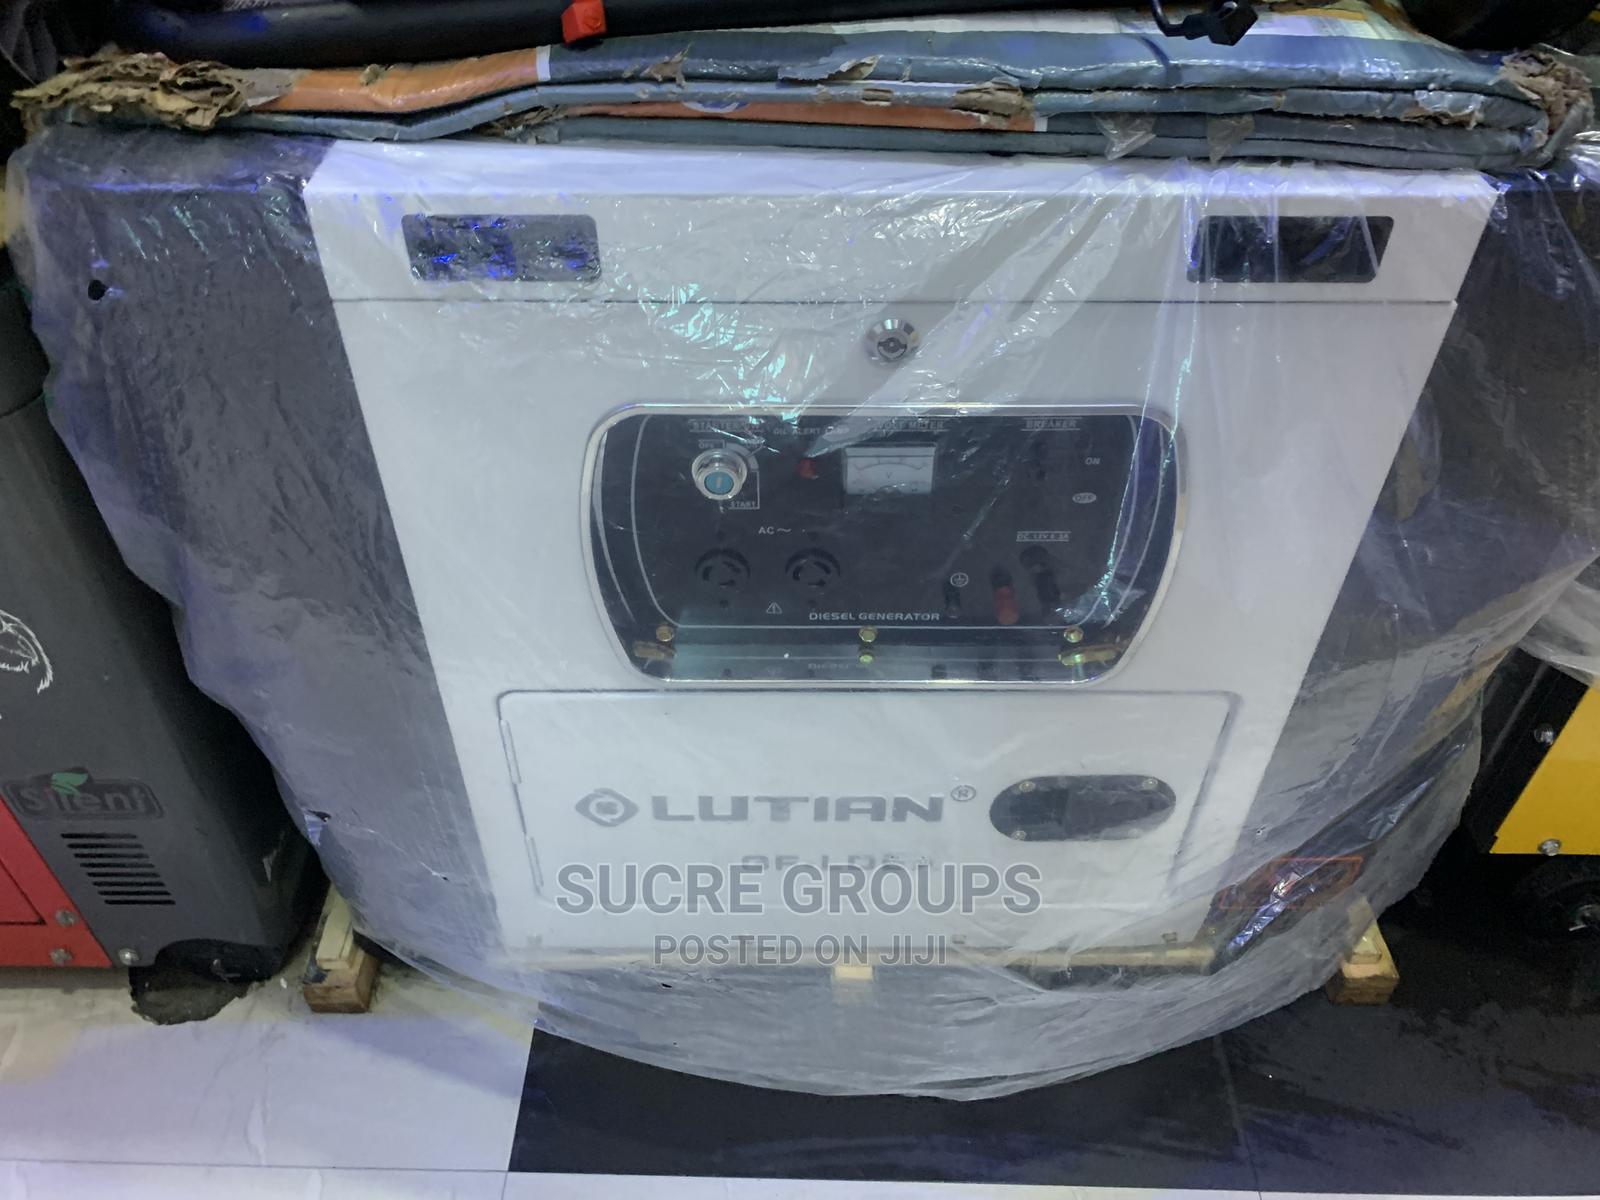 10kva Lutian Soundproof Generator